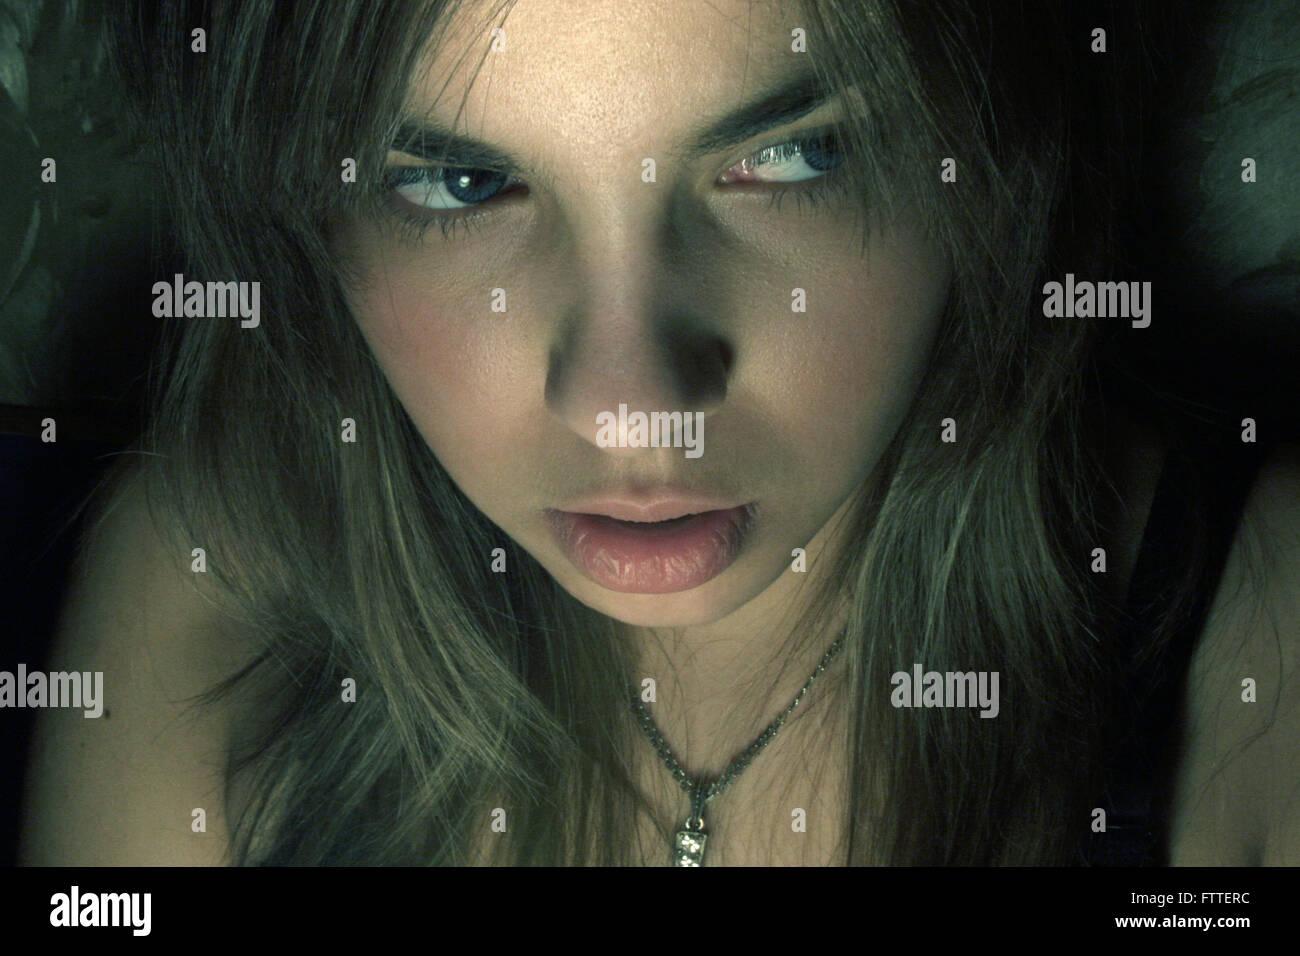 Junge Frau Thriller closeup Stockfoto